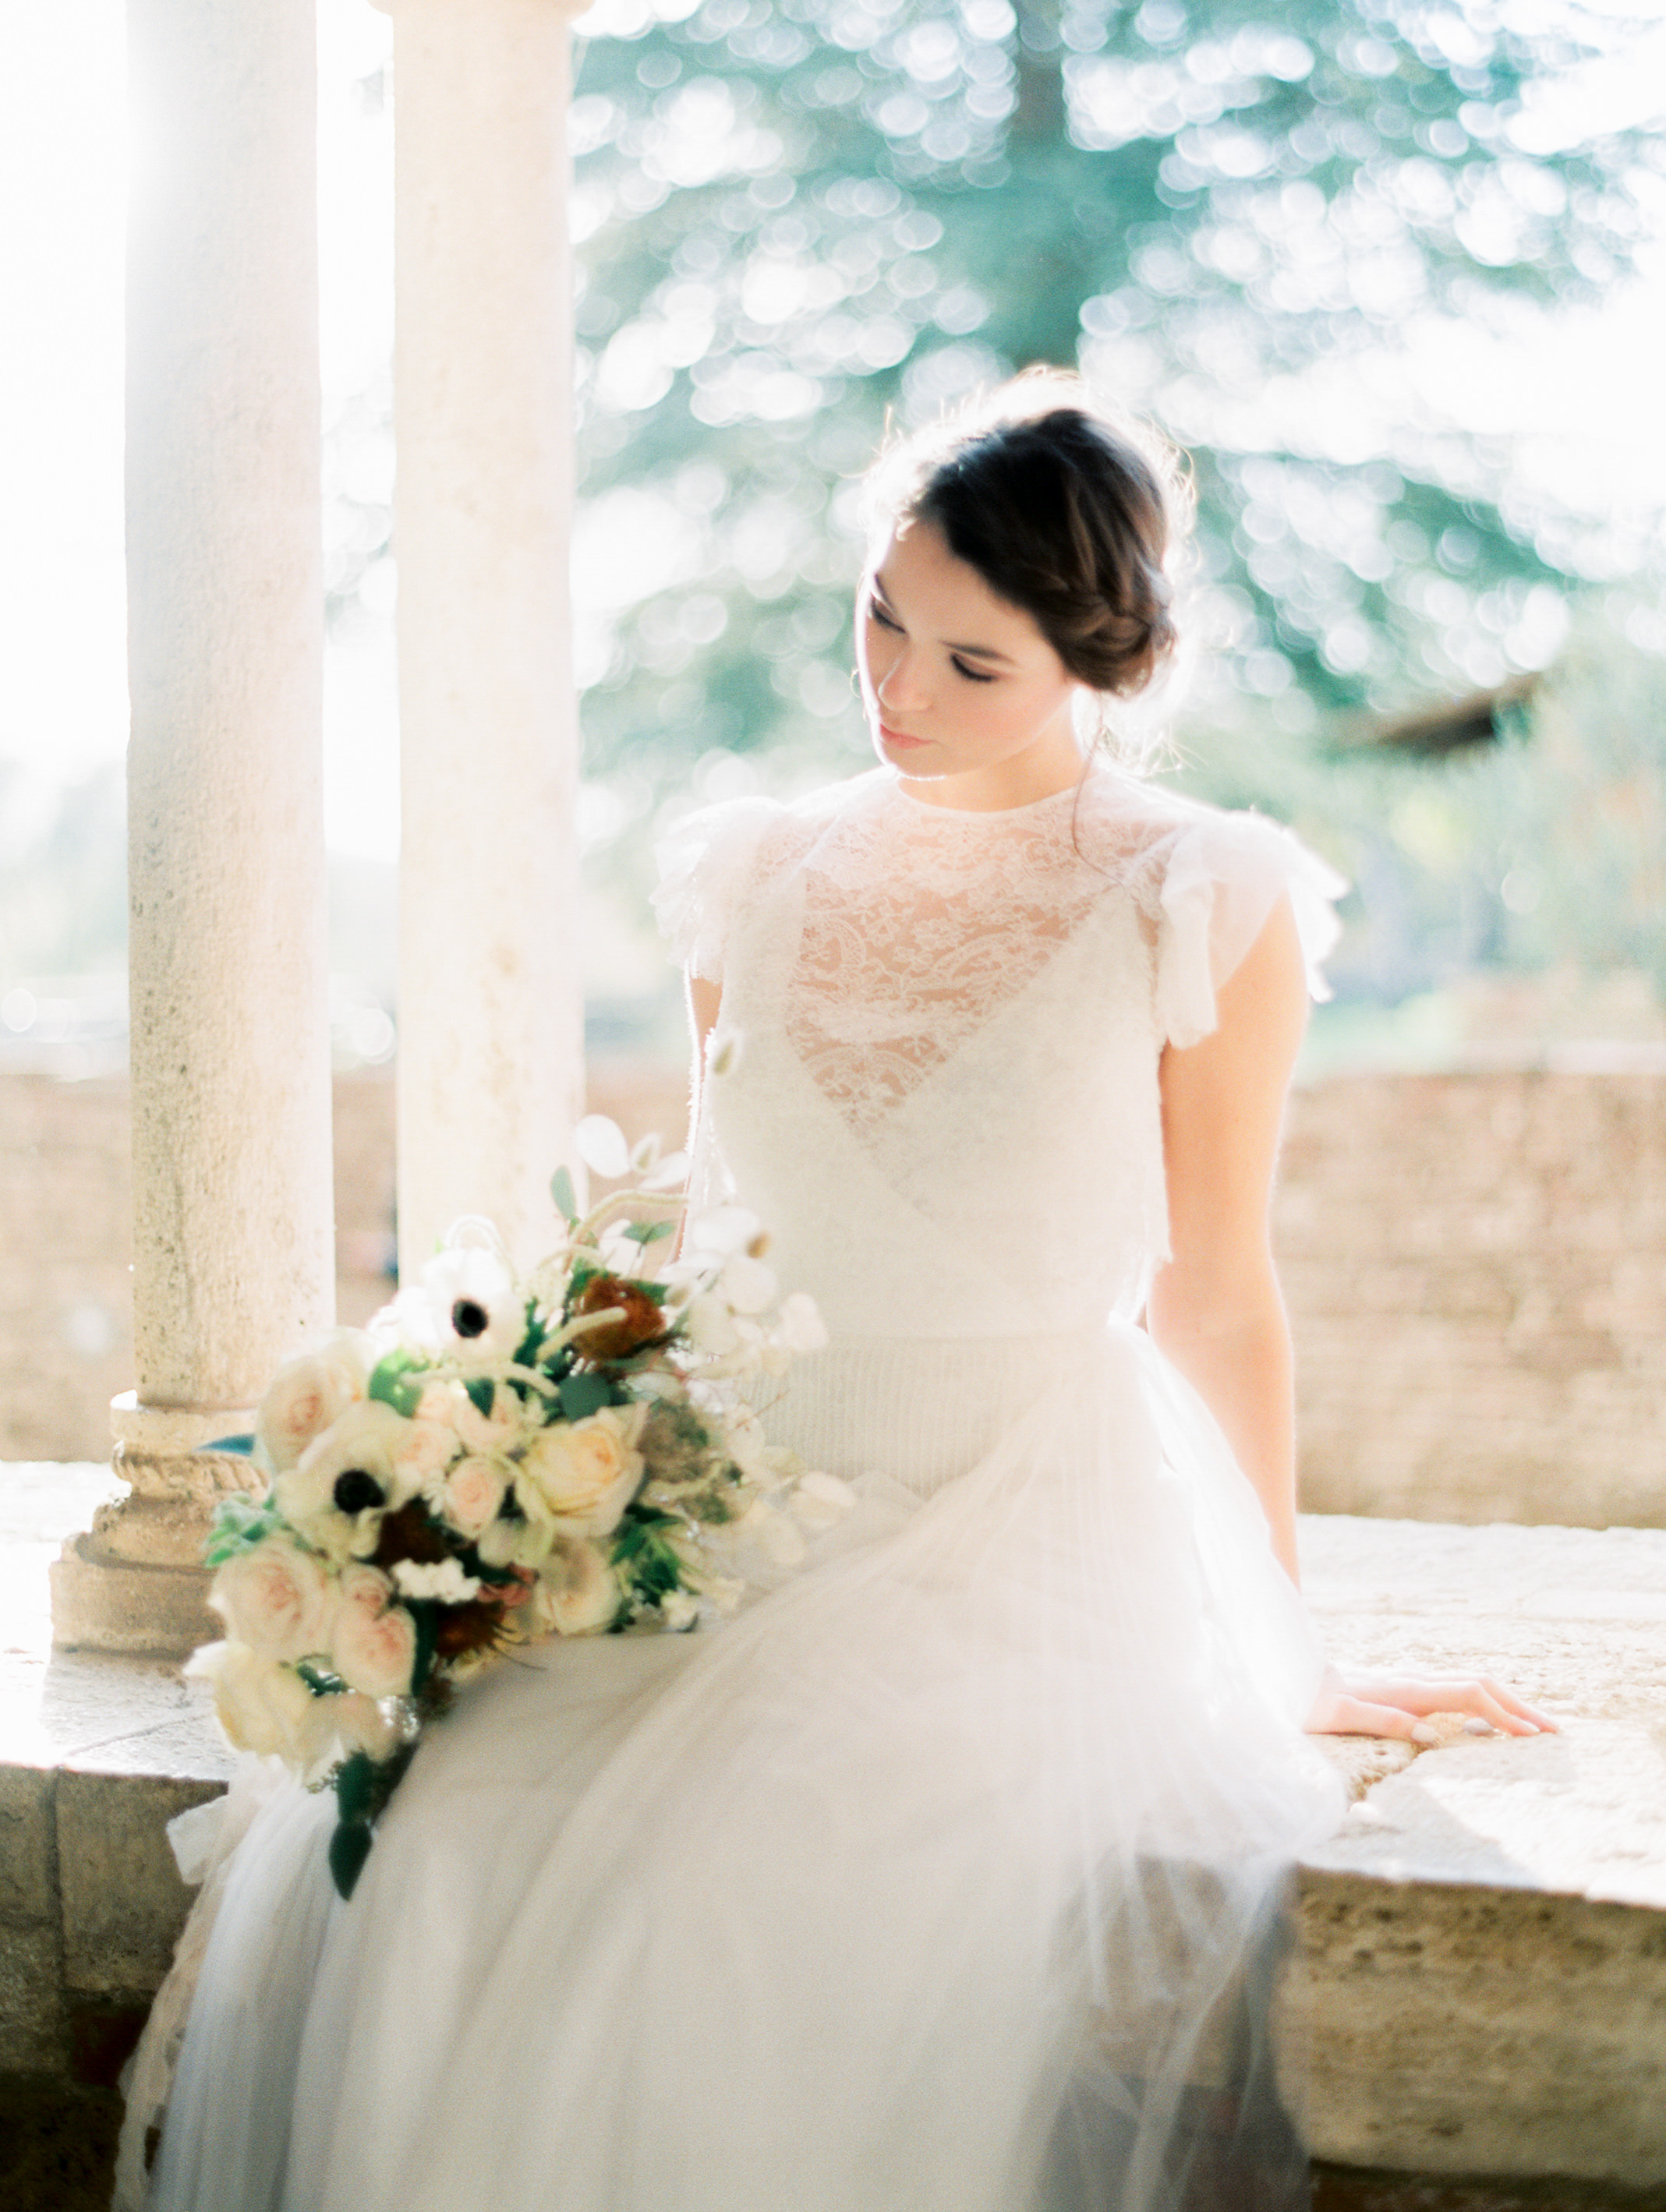 romantic-italy-wedding-in-tuscany-99.jpg